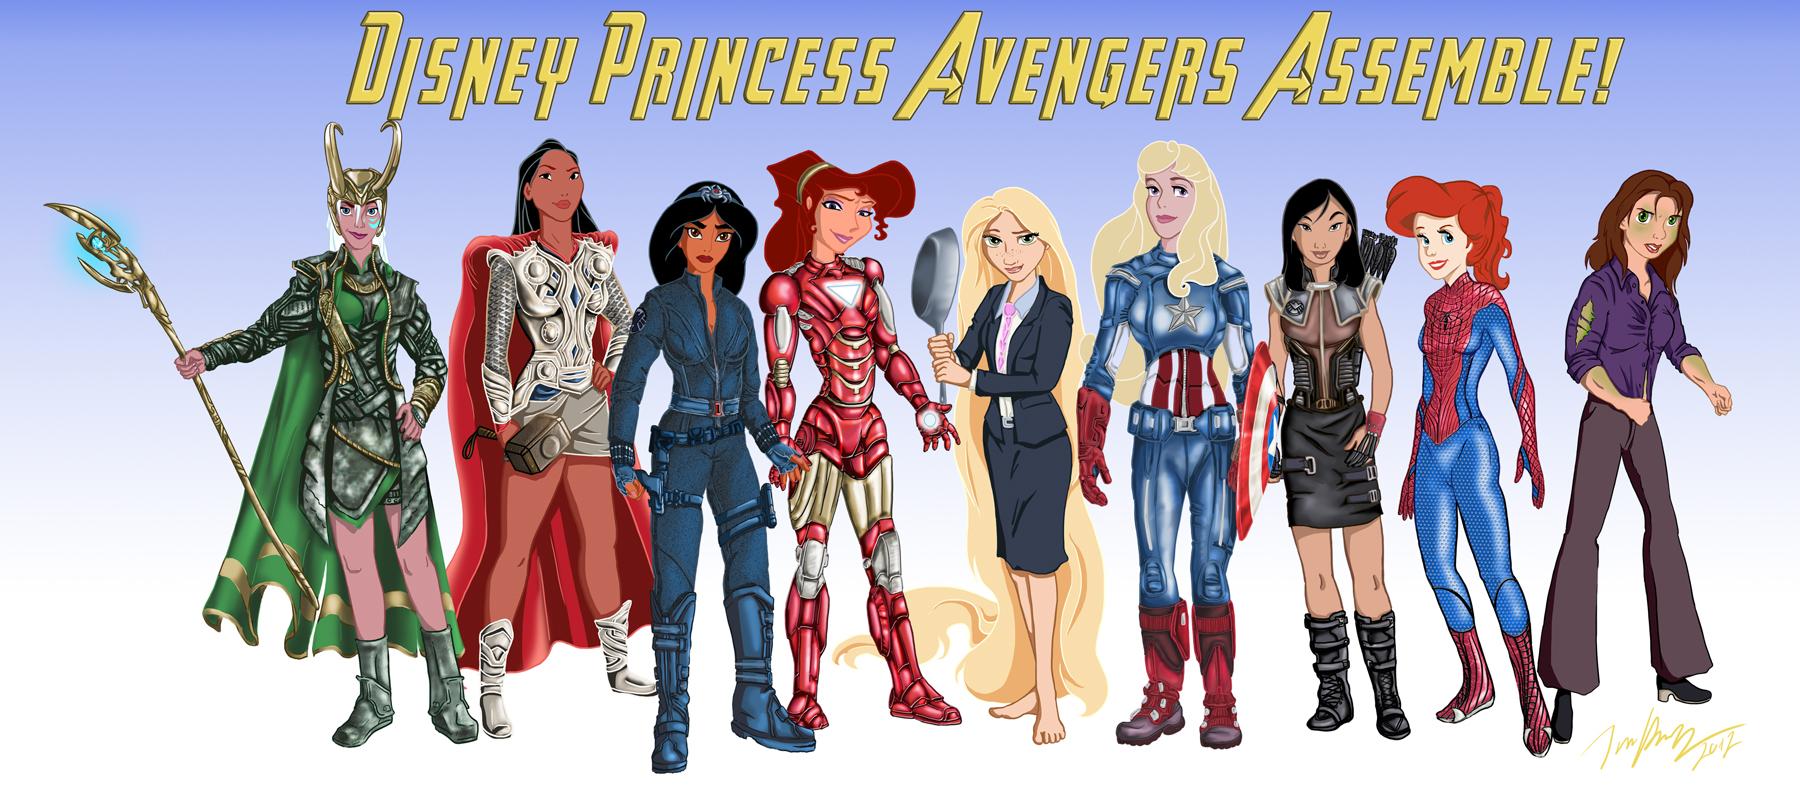 Disney Princess Avengers